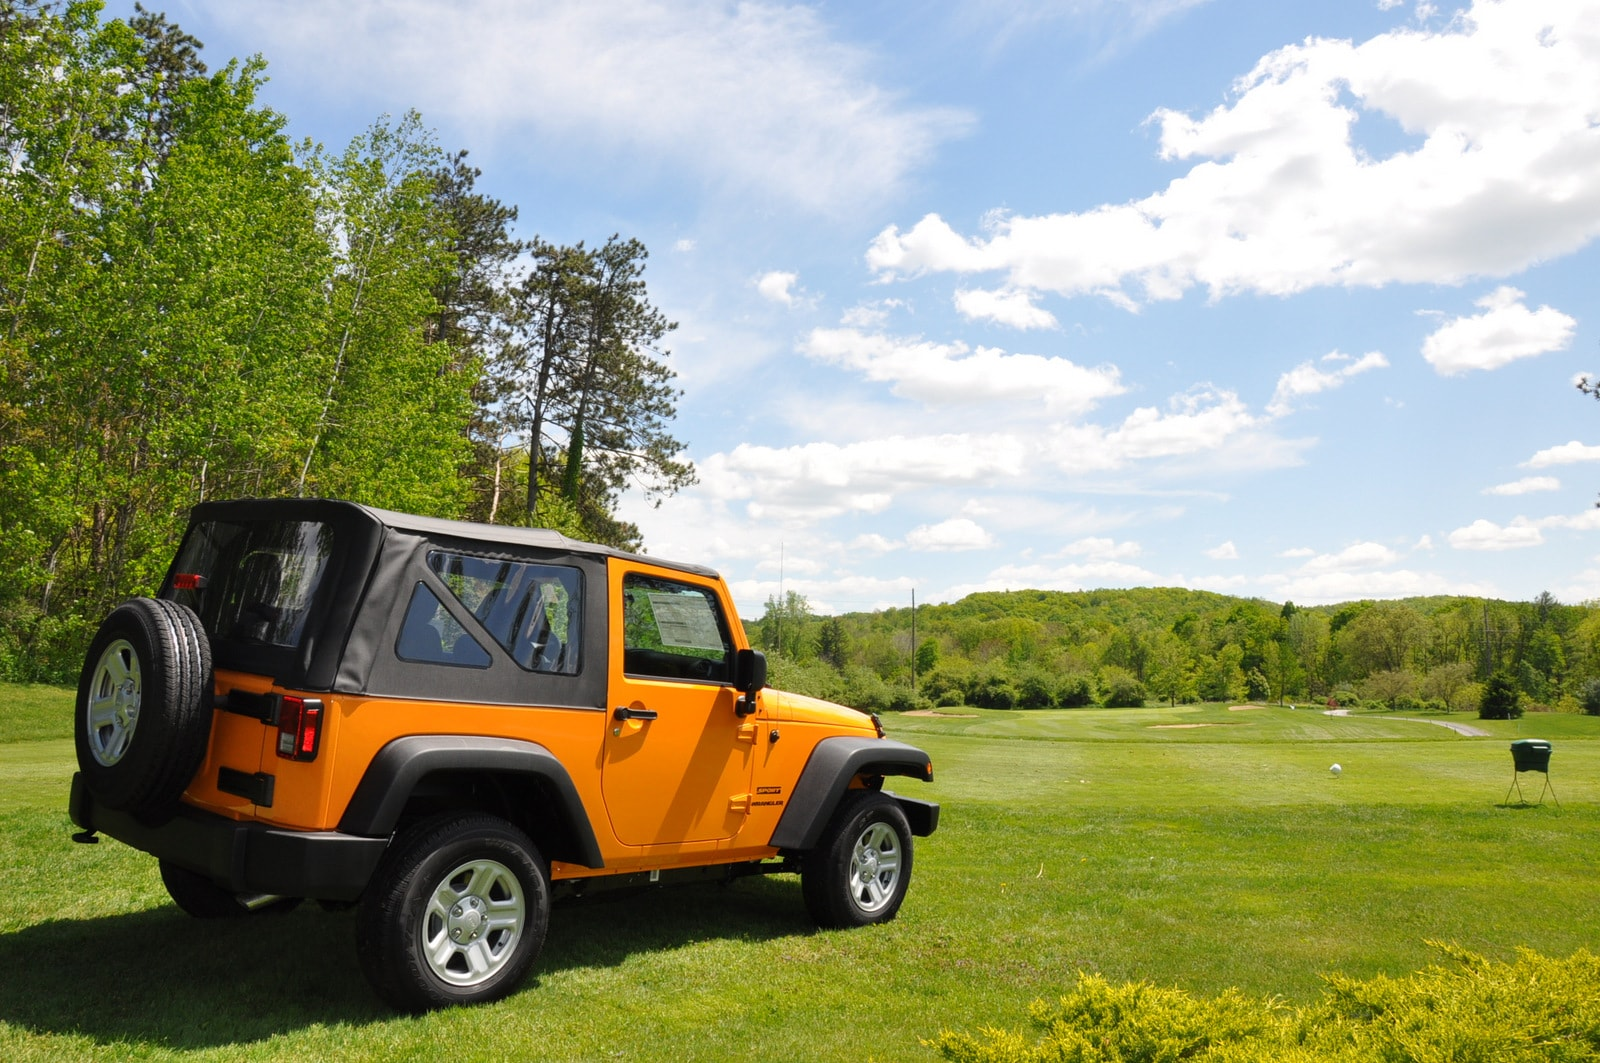 Dutchess chrysler jeep #2